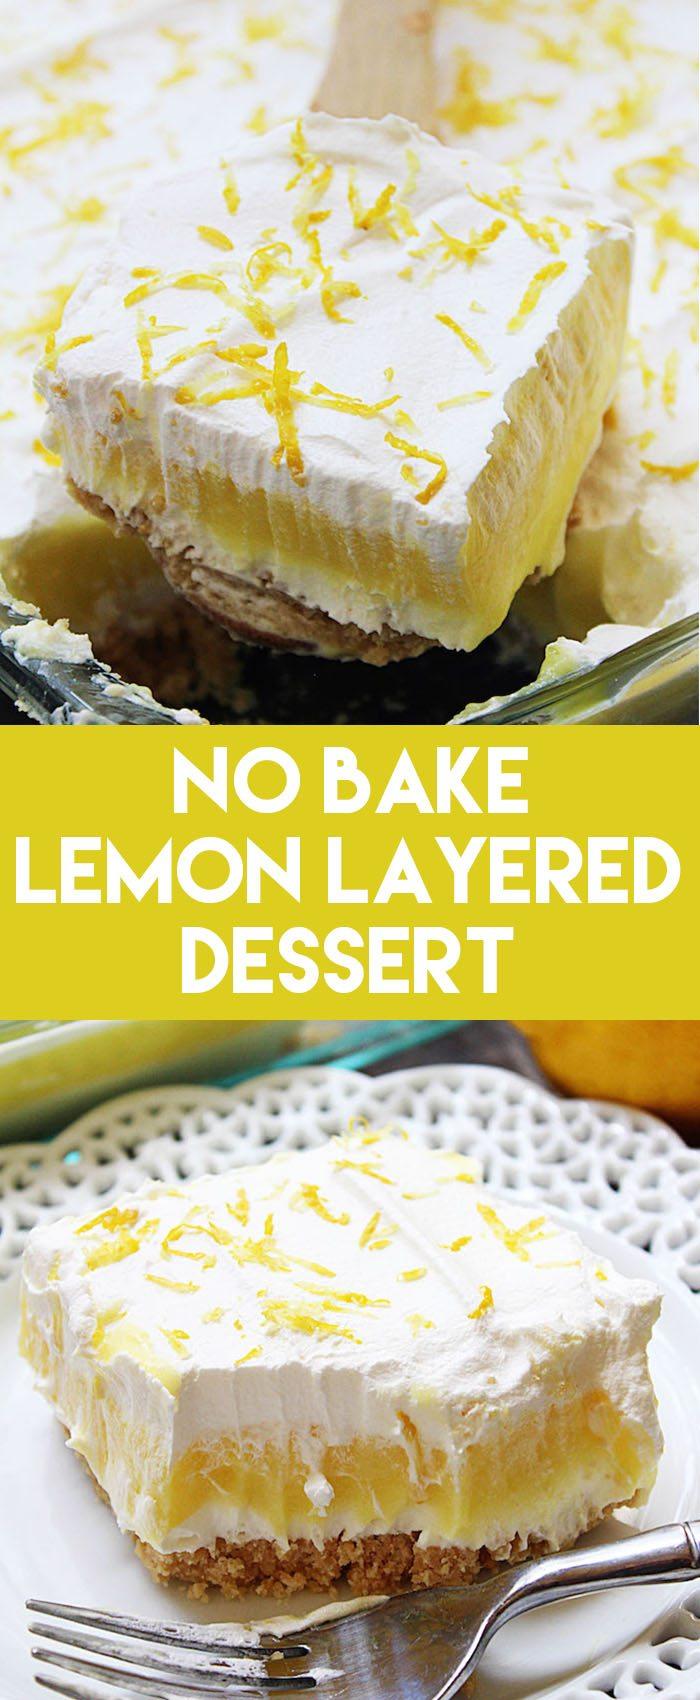 This No Bake Lemon Layered Dessert makes for an easy dessert recipe! Golden Oreos, cheesecake, lemon pudding, and whipped topping make it taste awesome! #nobake #dessert #nobakedessert #lemon #easydessert